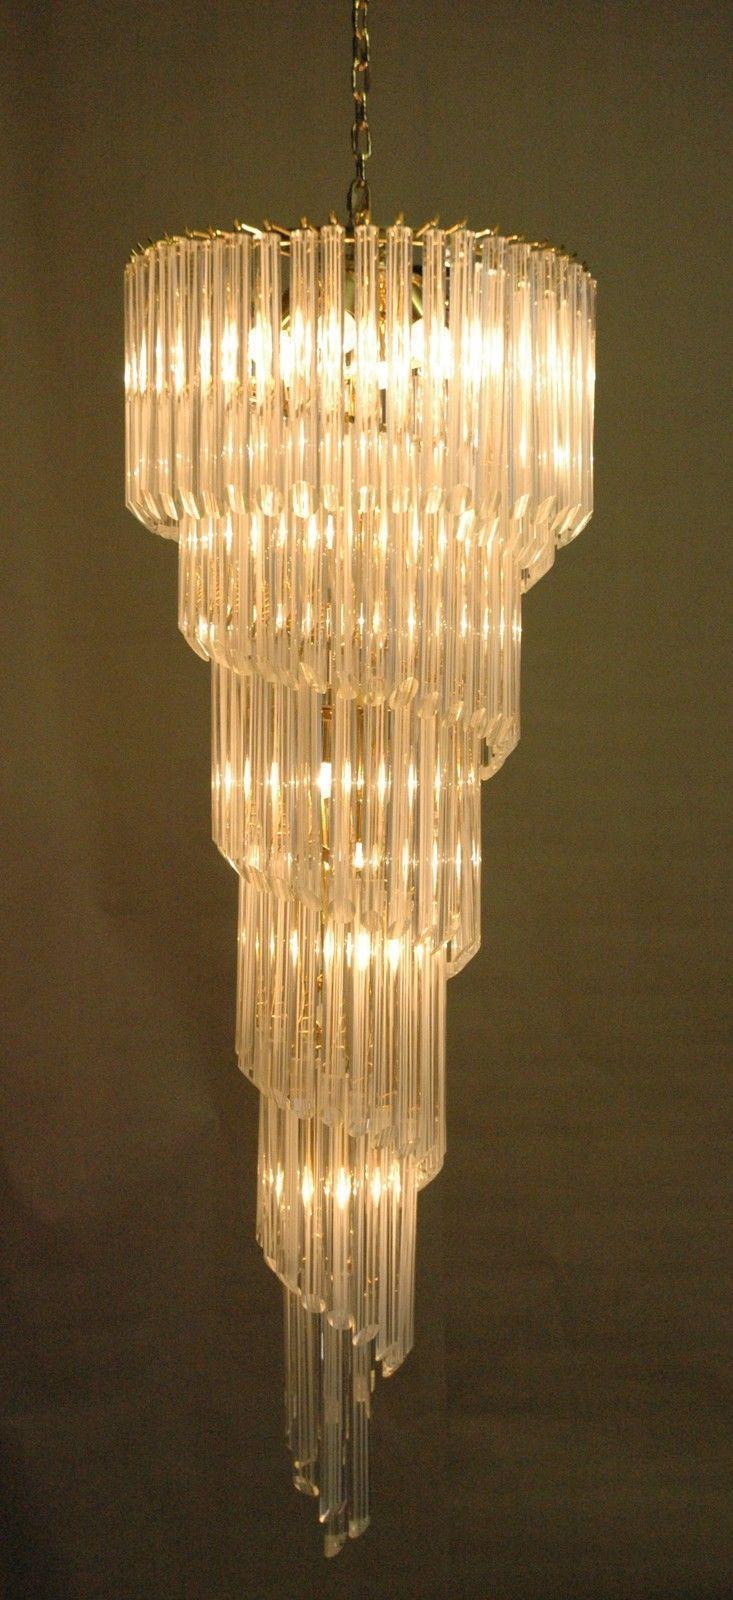 Murano glass spiral chandeliers Novaresi , Vistosi Mazzega venini ...